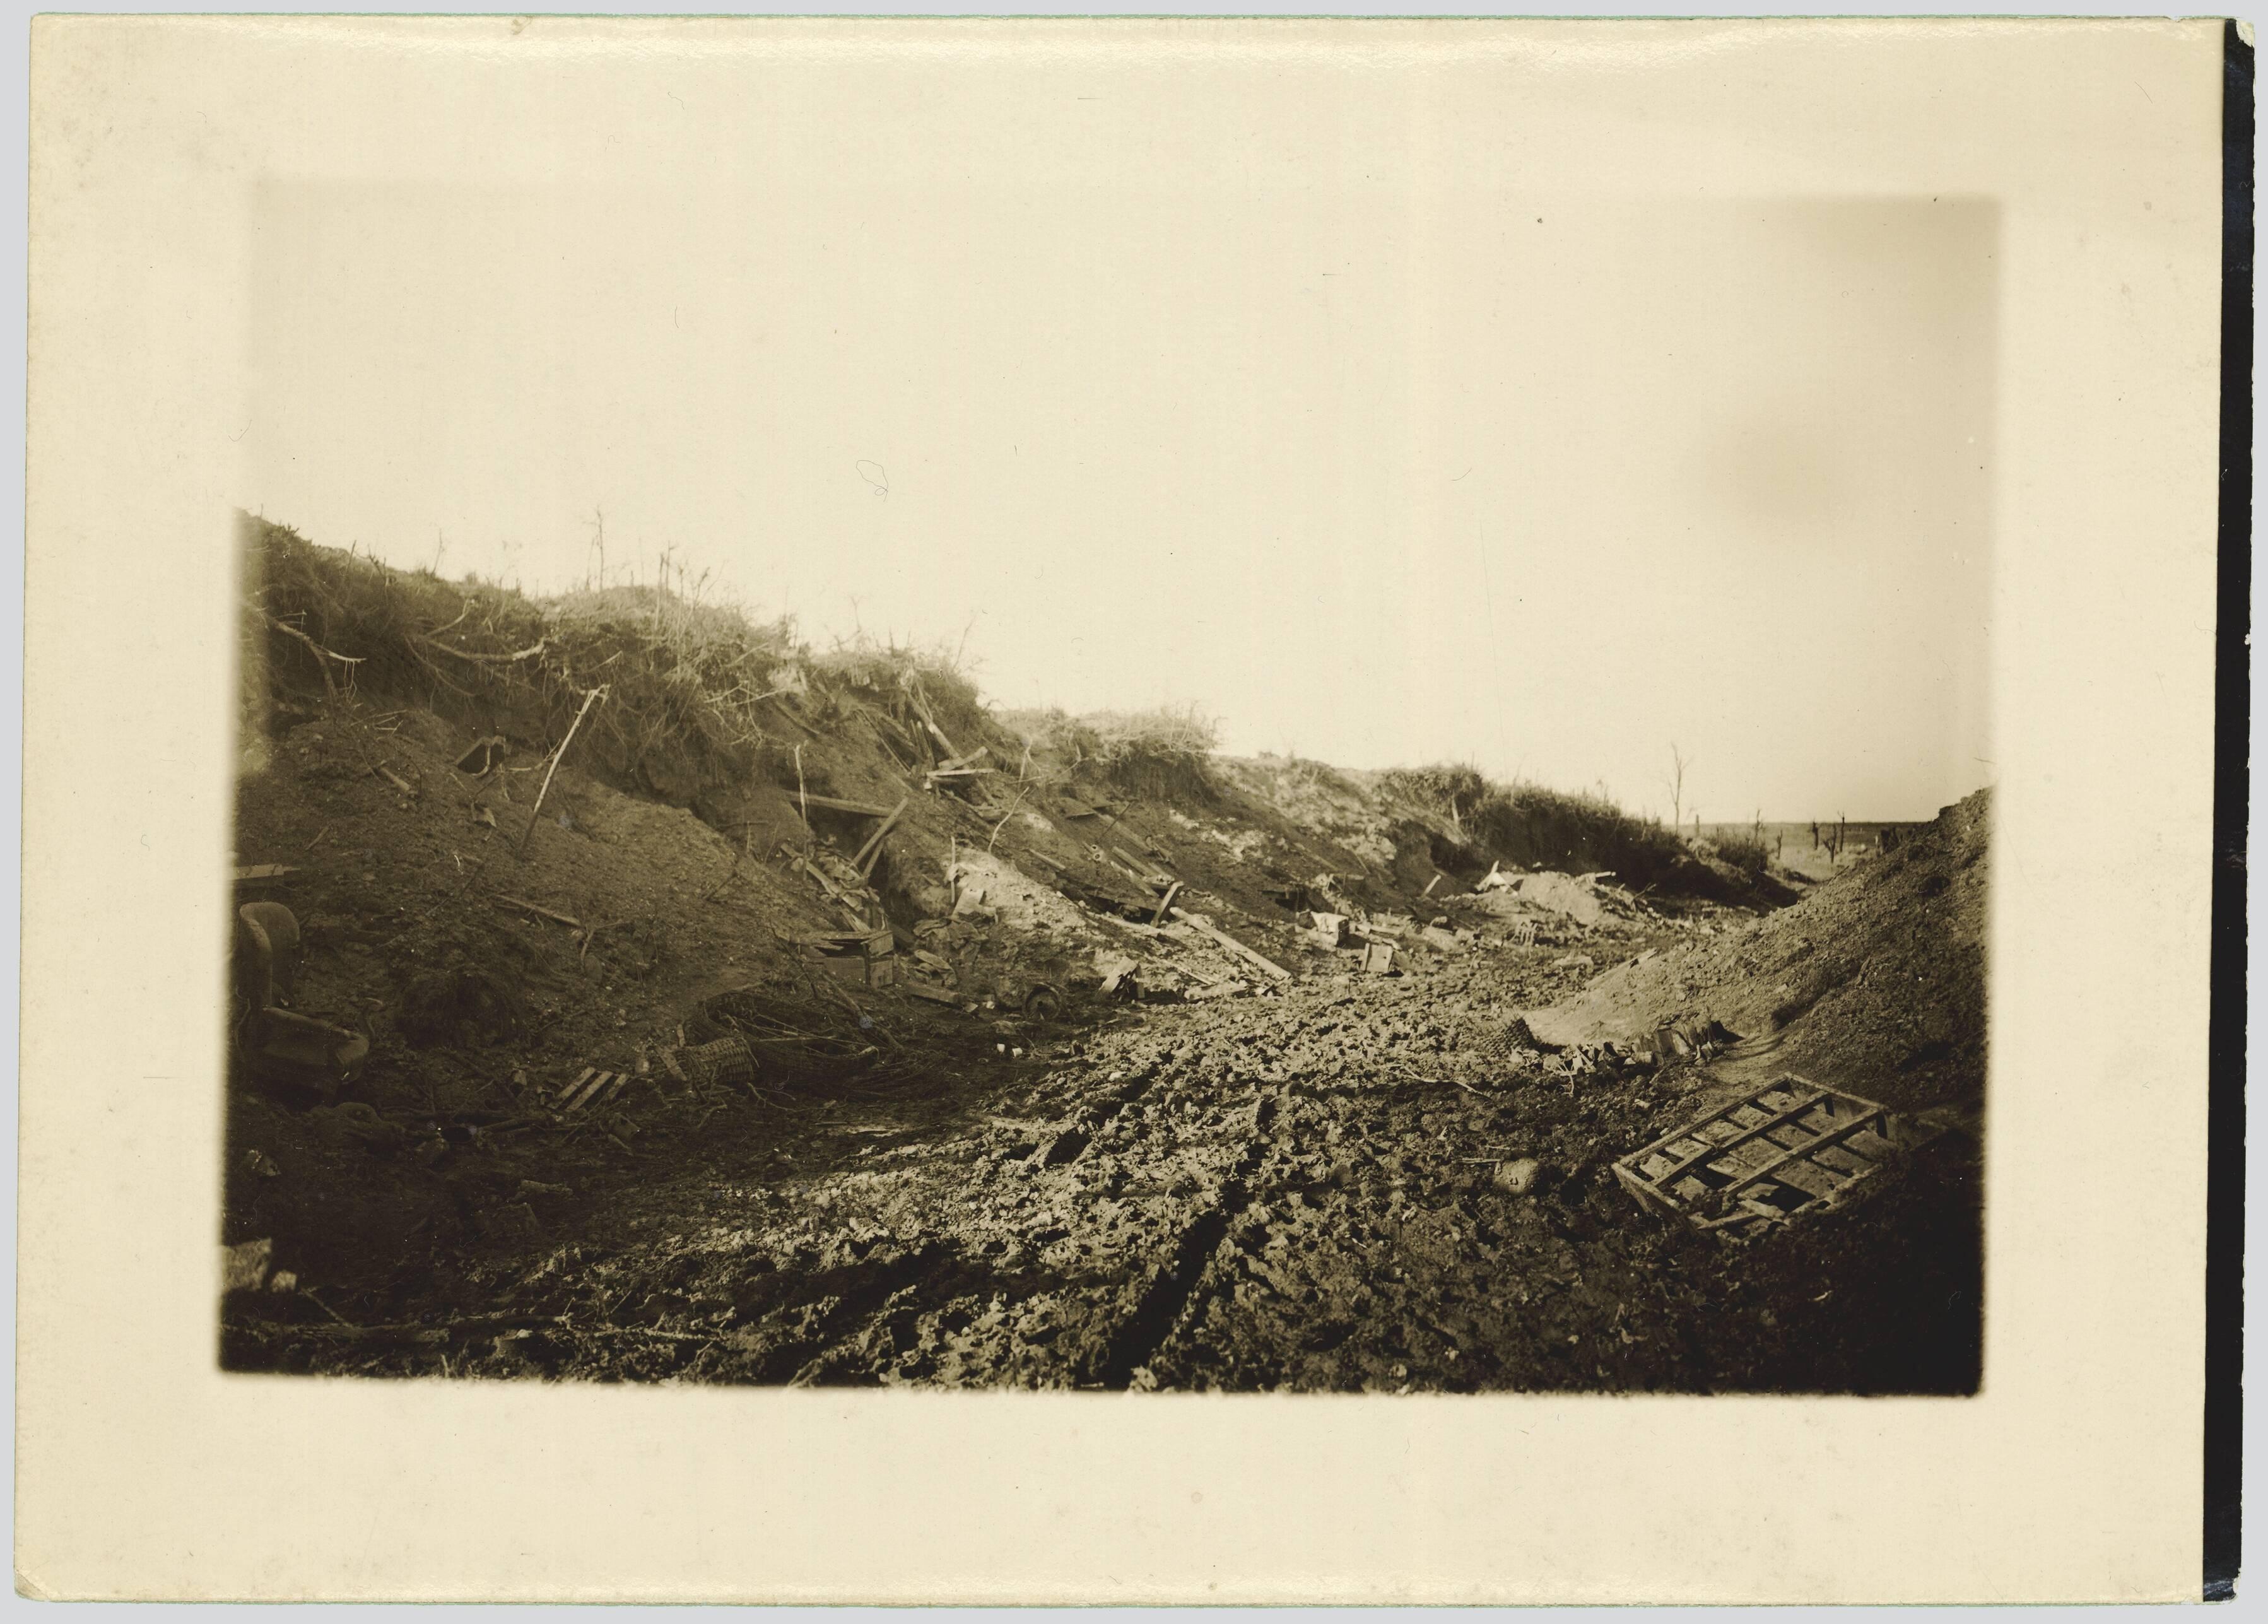 CHEMIN CREUX DE BERNY-EN-SANTERRE A BELLOY-EN-SANTERRE. SEPTEMBRE 1916